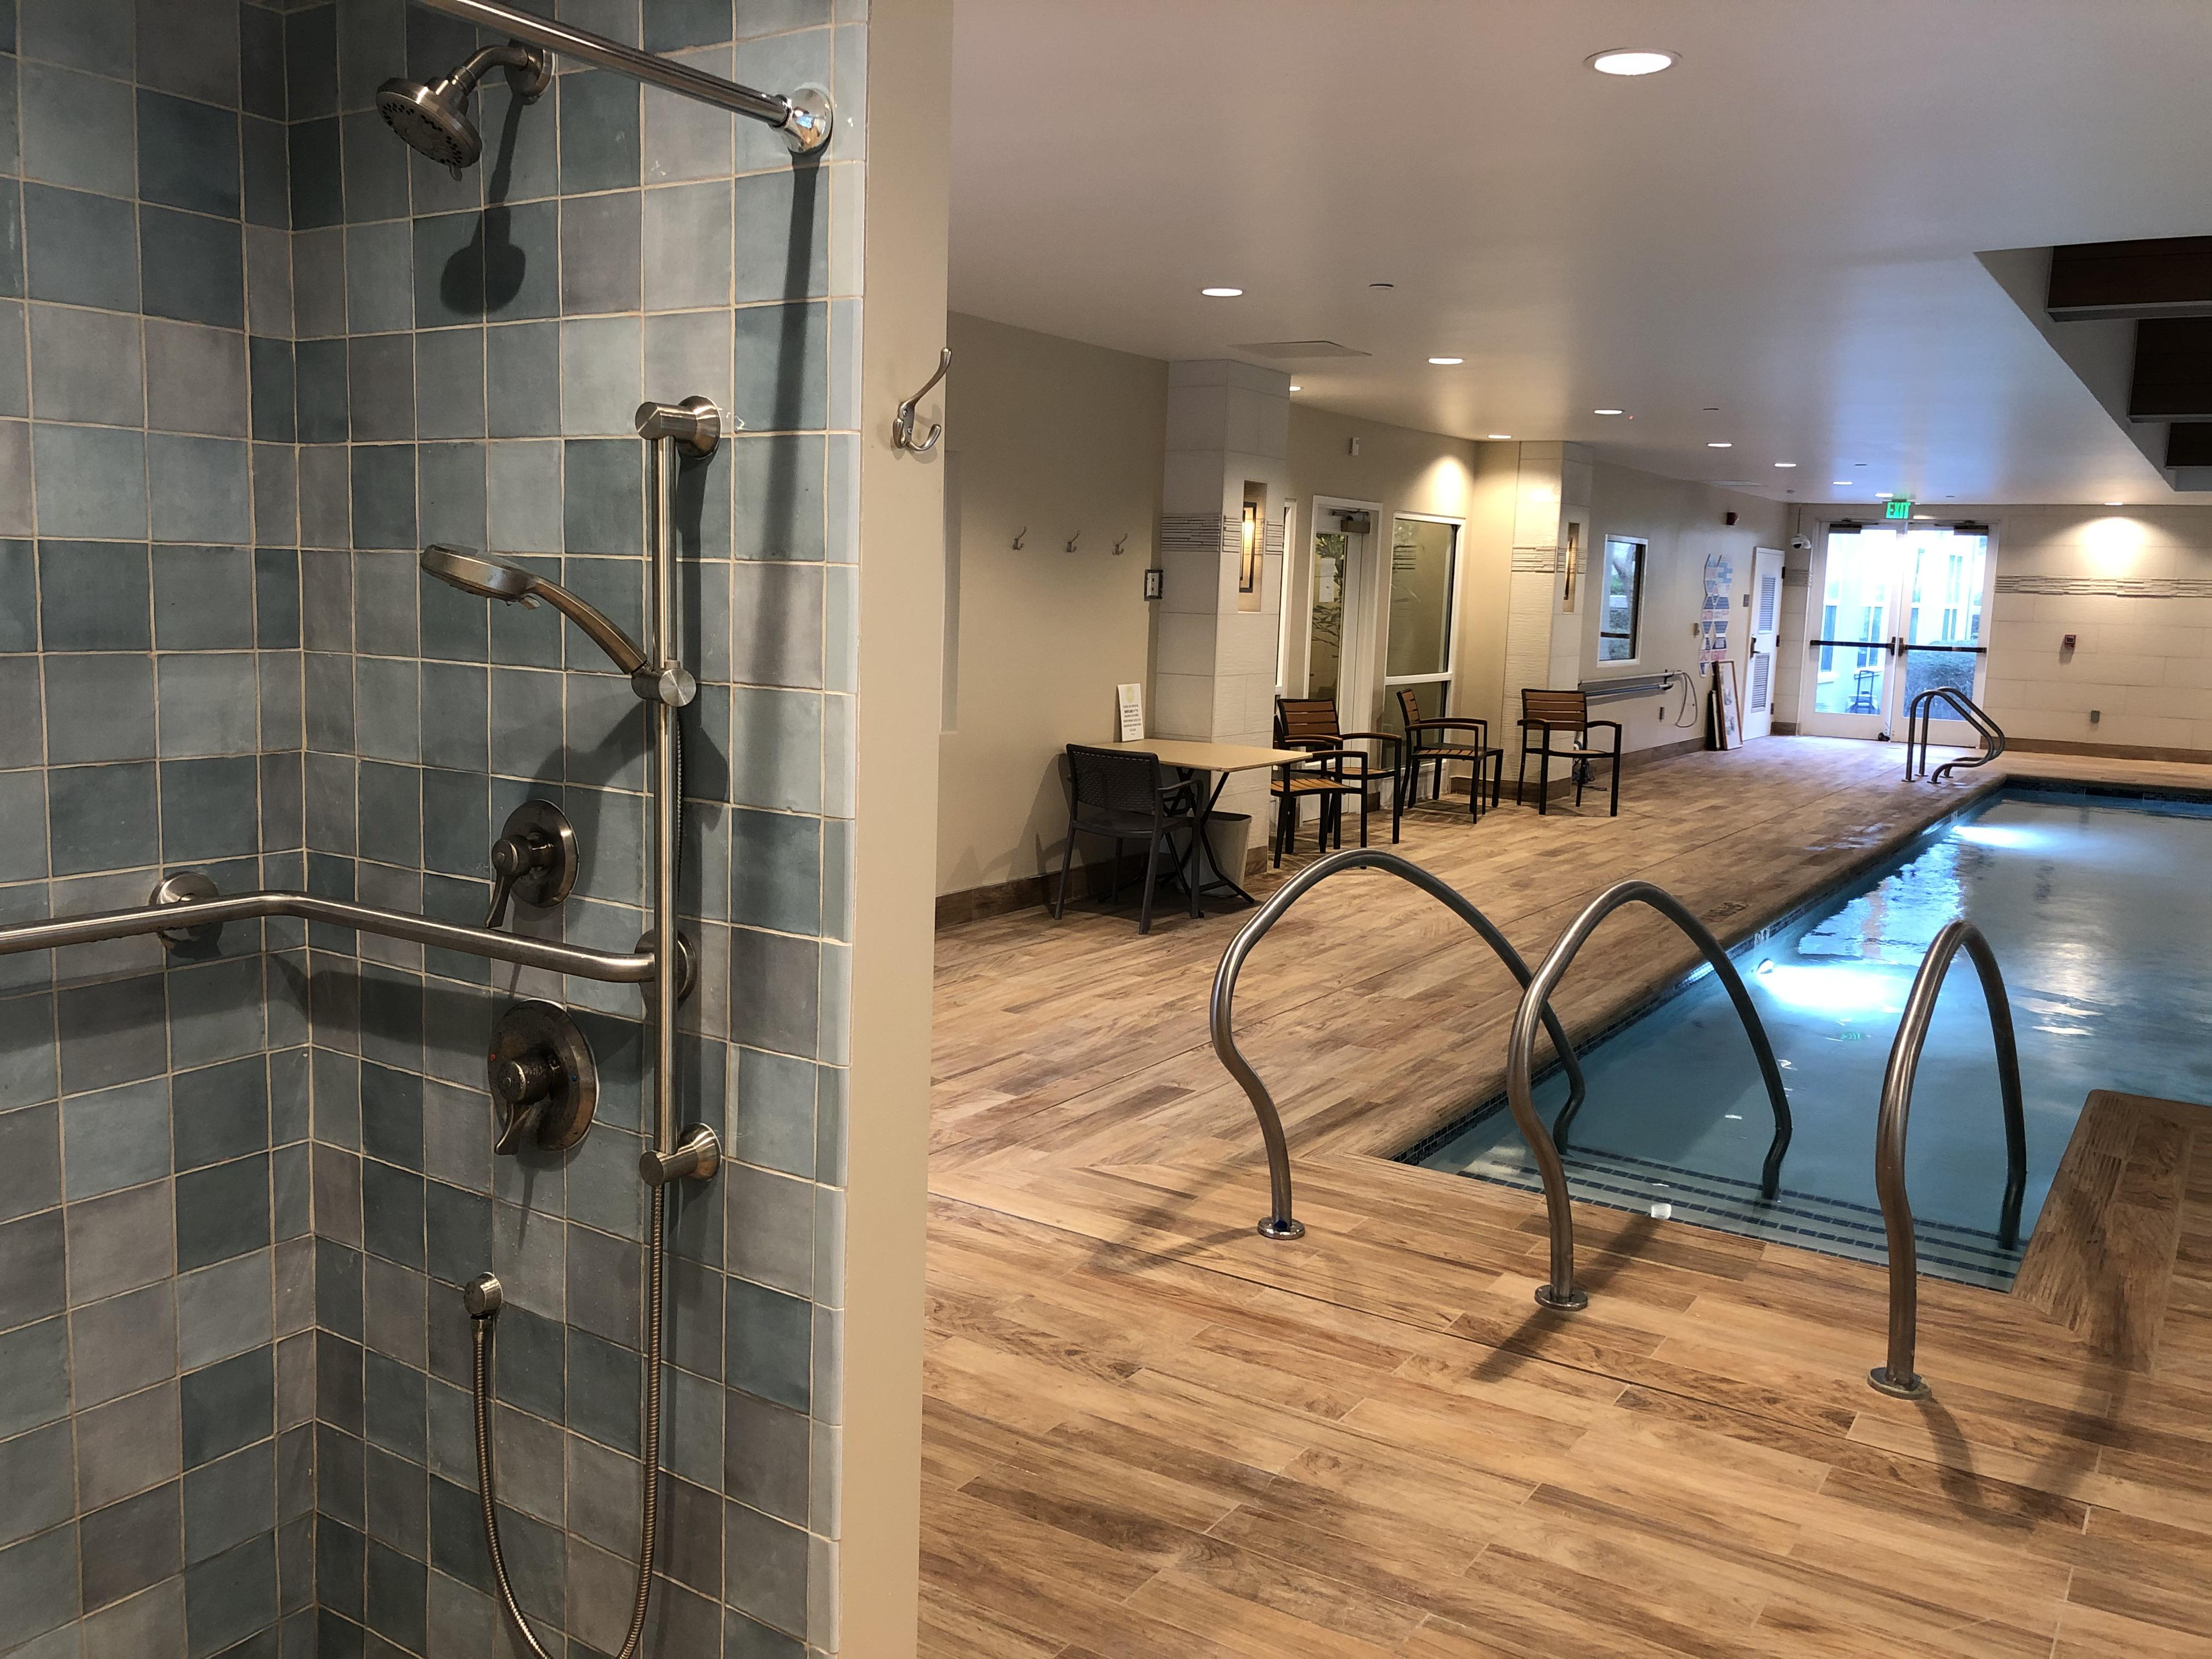 Interior Pool Remodel ceramic tile Mediterranean luxury trespa panels indoor pool